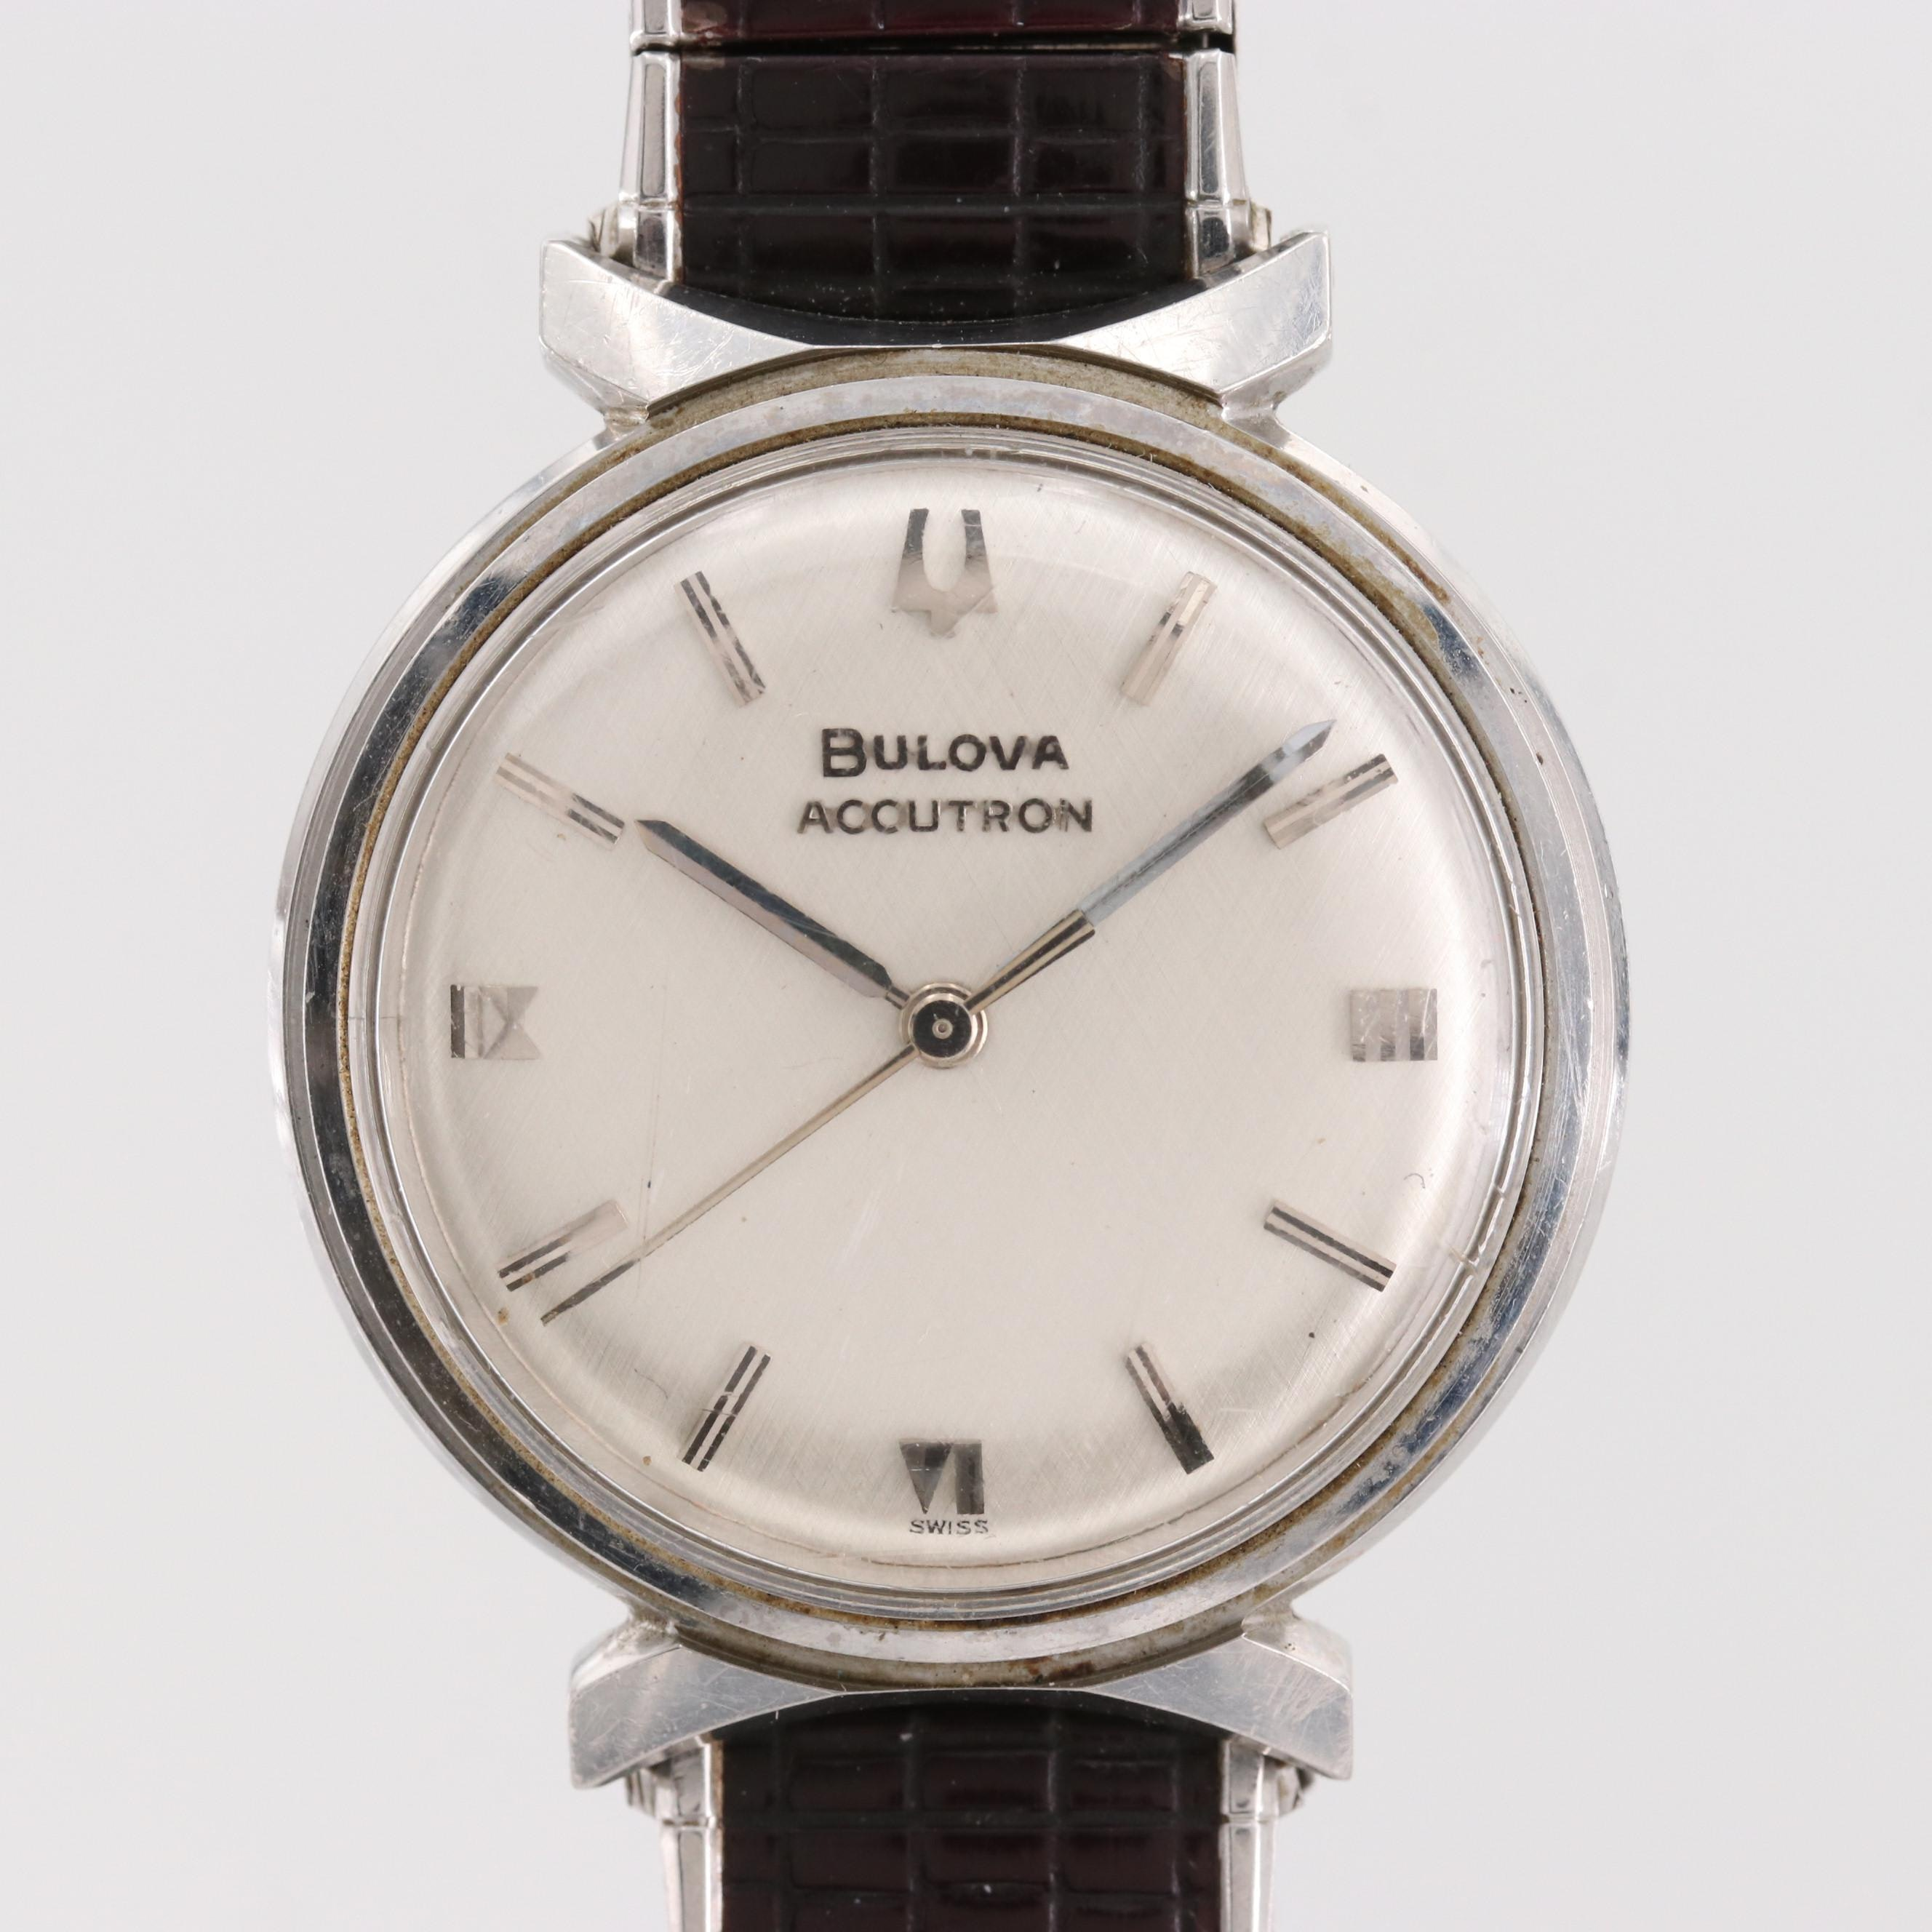 Vintage Bulova Accutron Tuning Fork Stainless Steel Wristwatch, Circa 1964